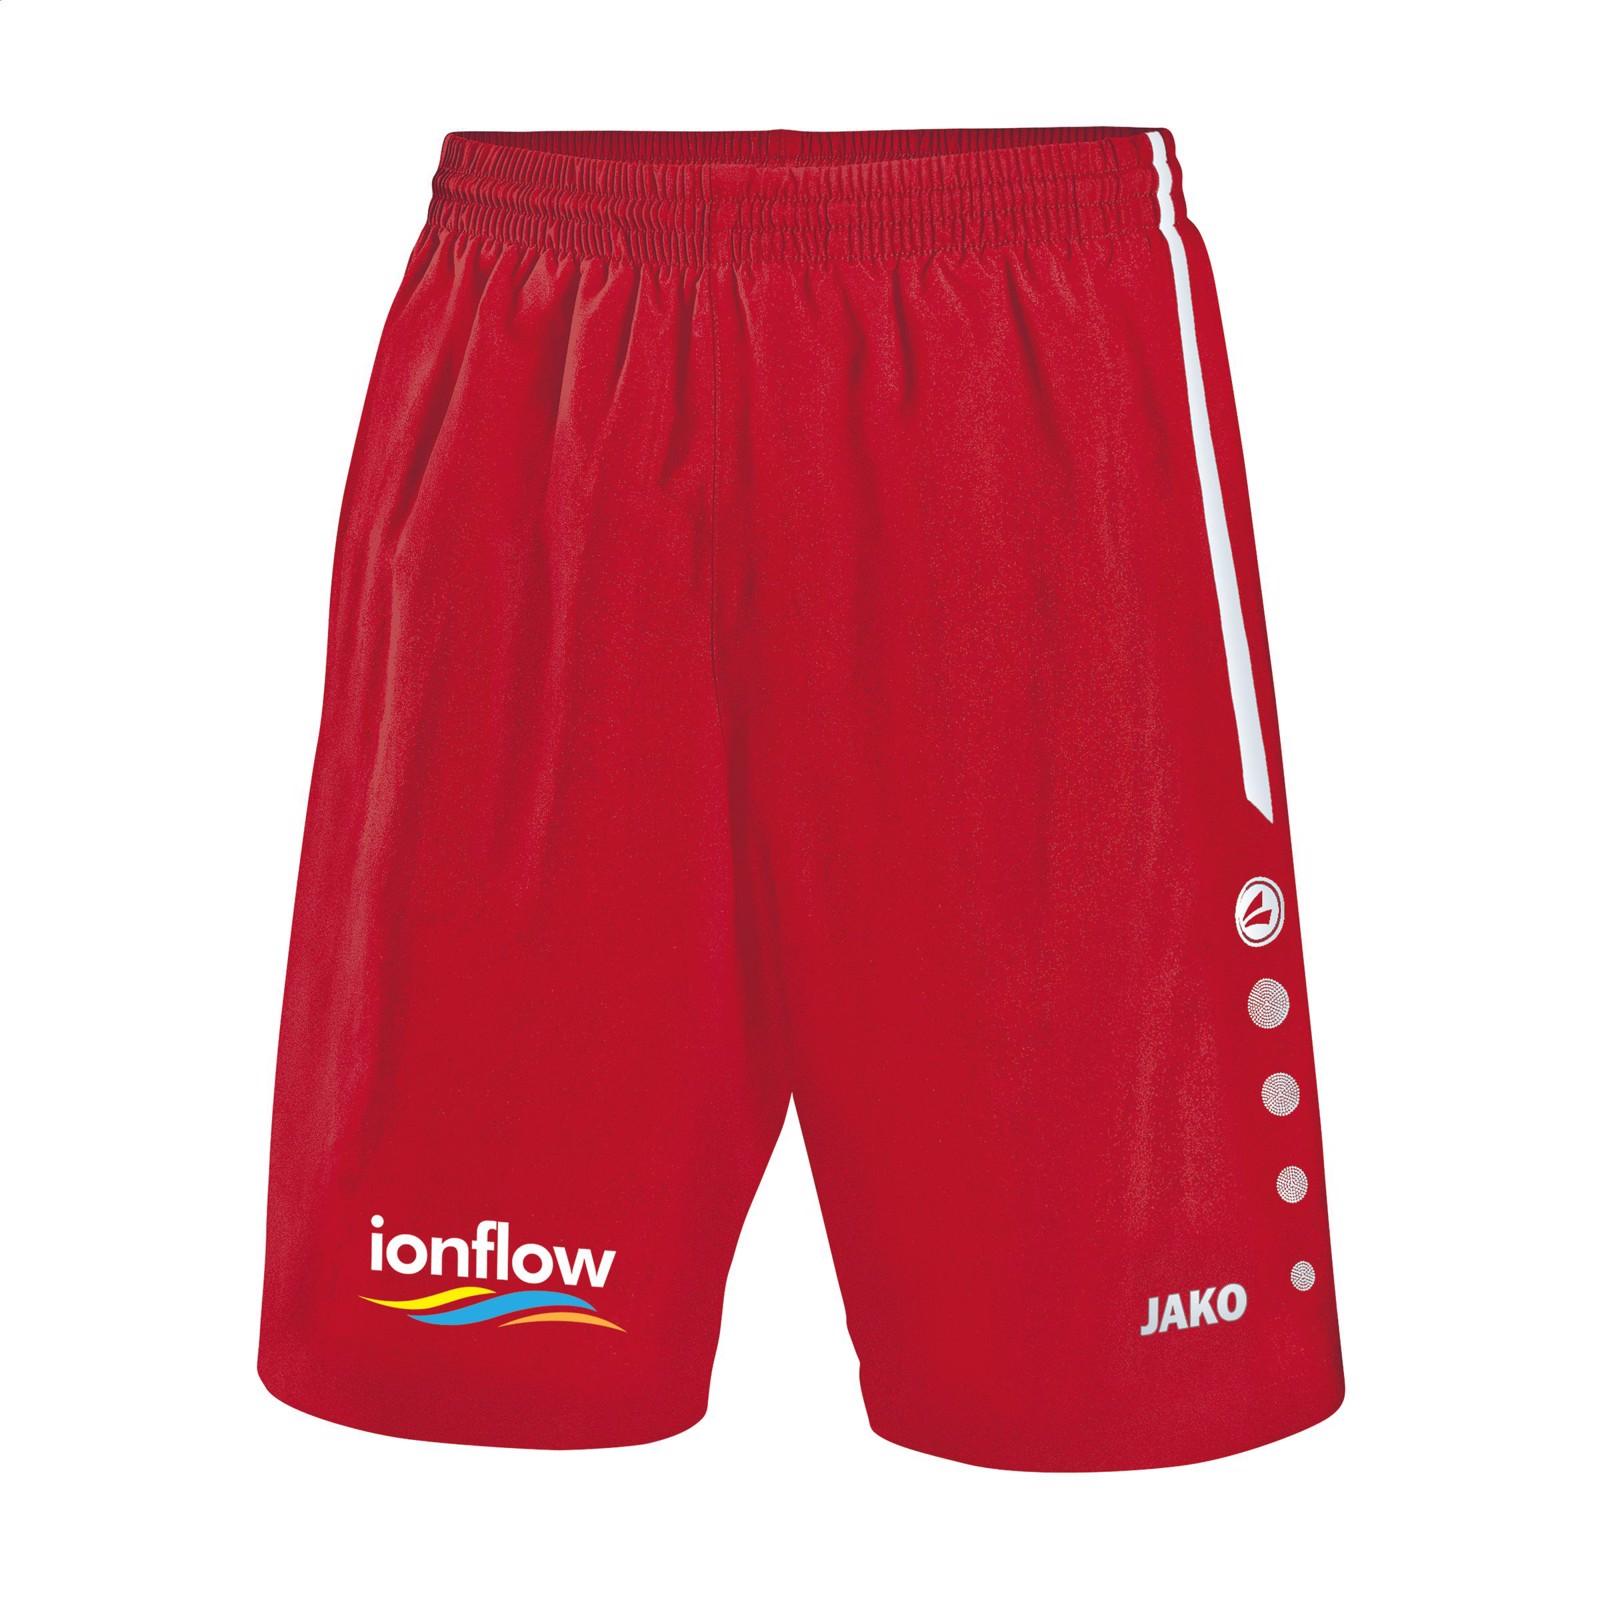 Jako® Shorts Turin mens - Red / White / M